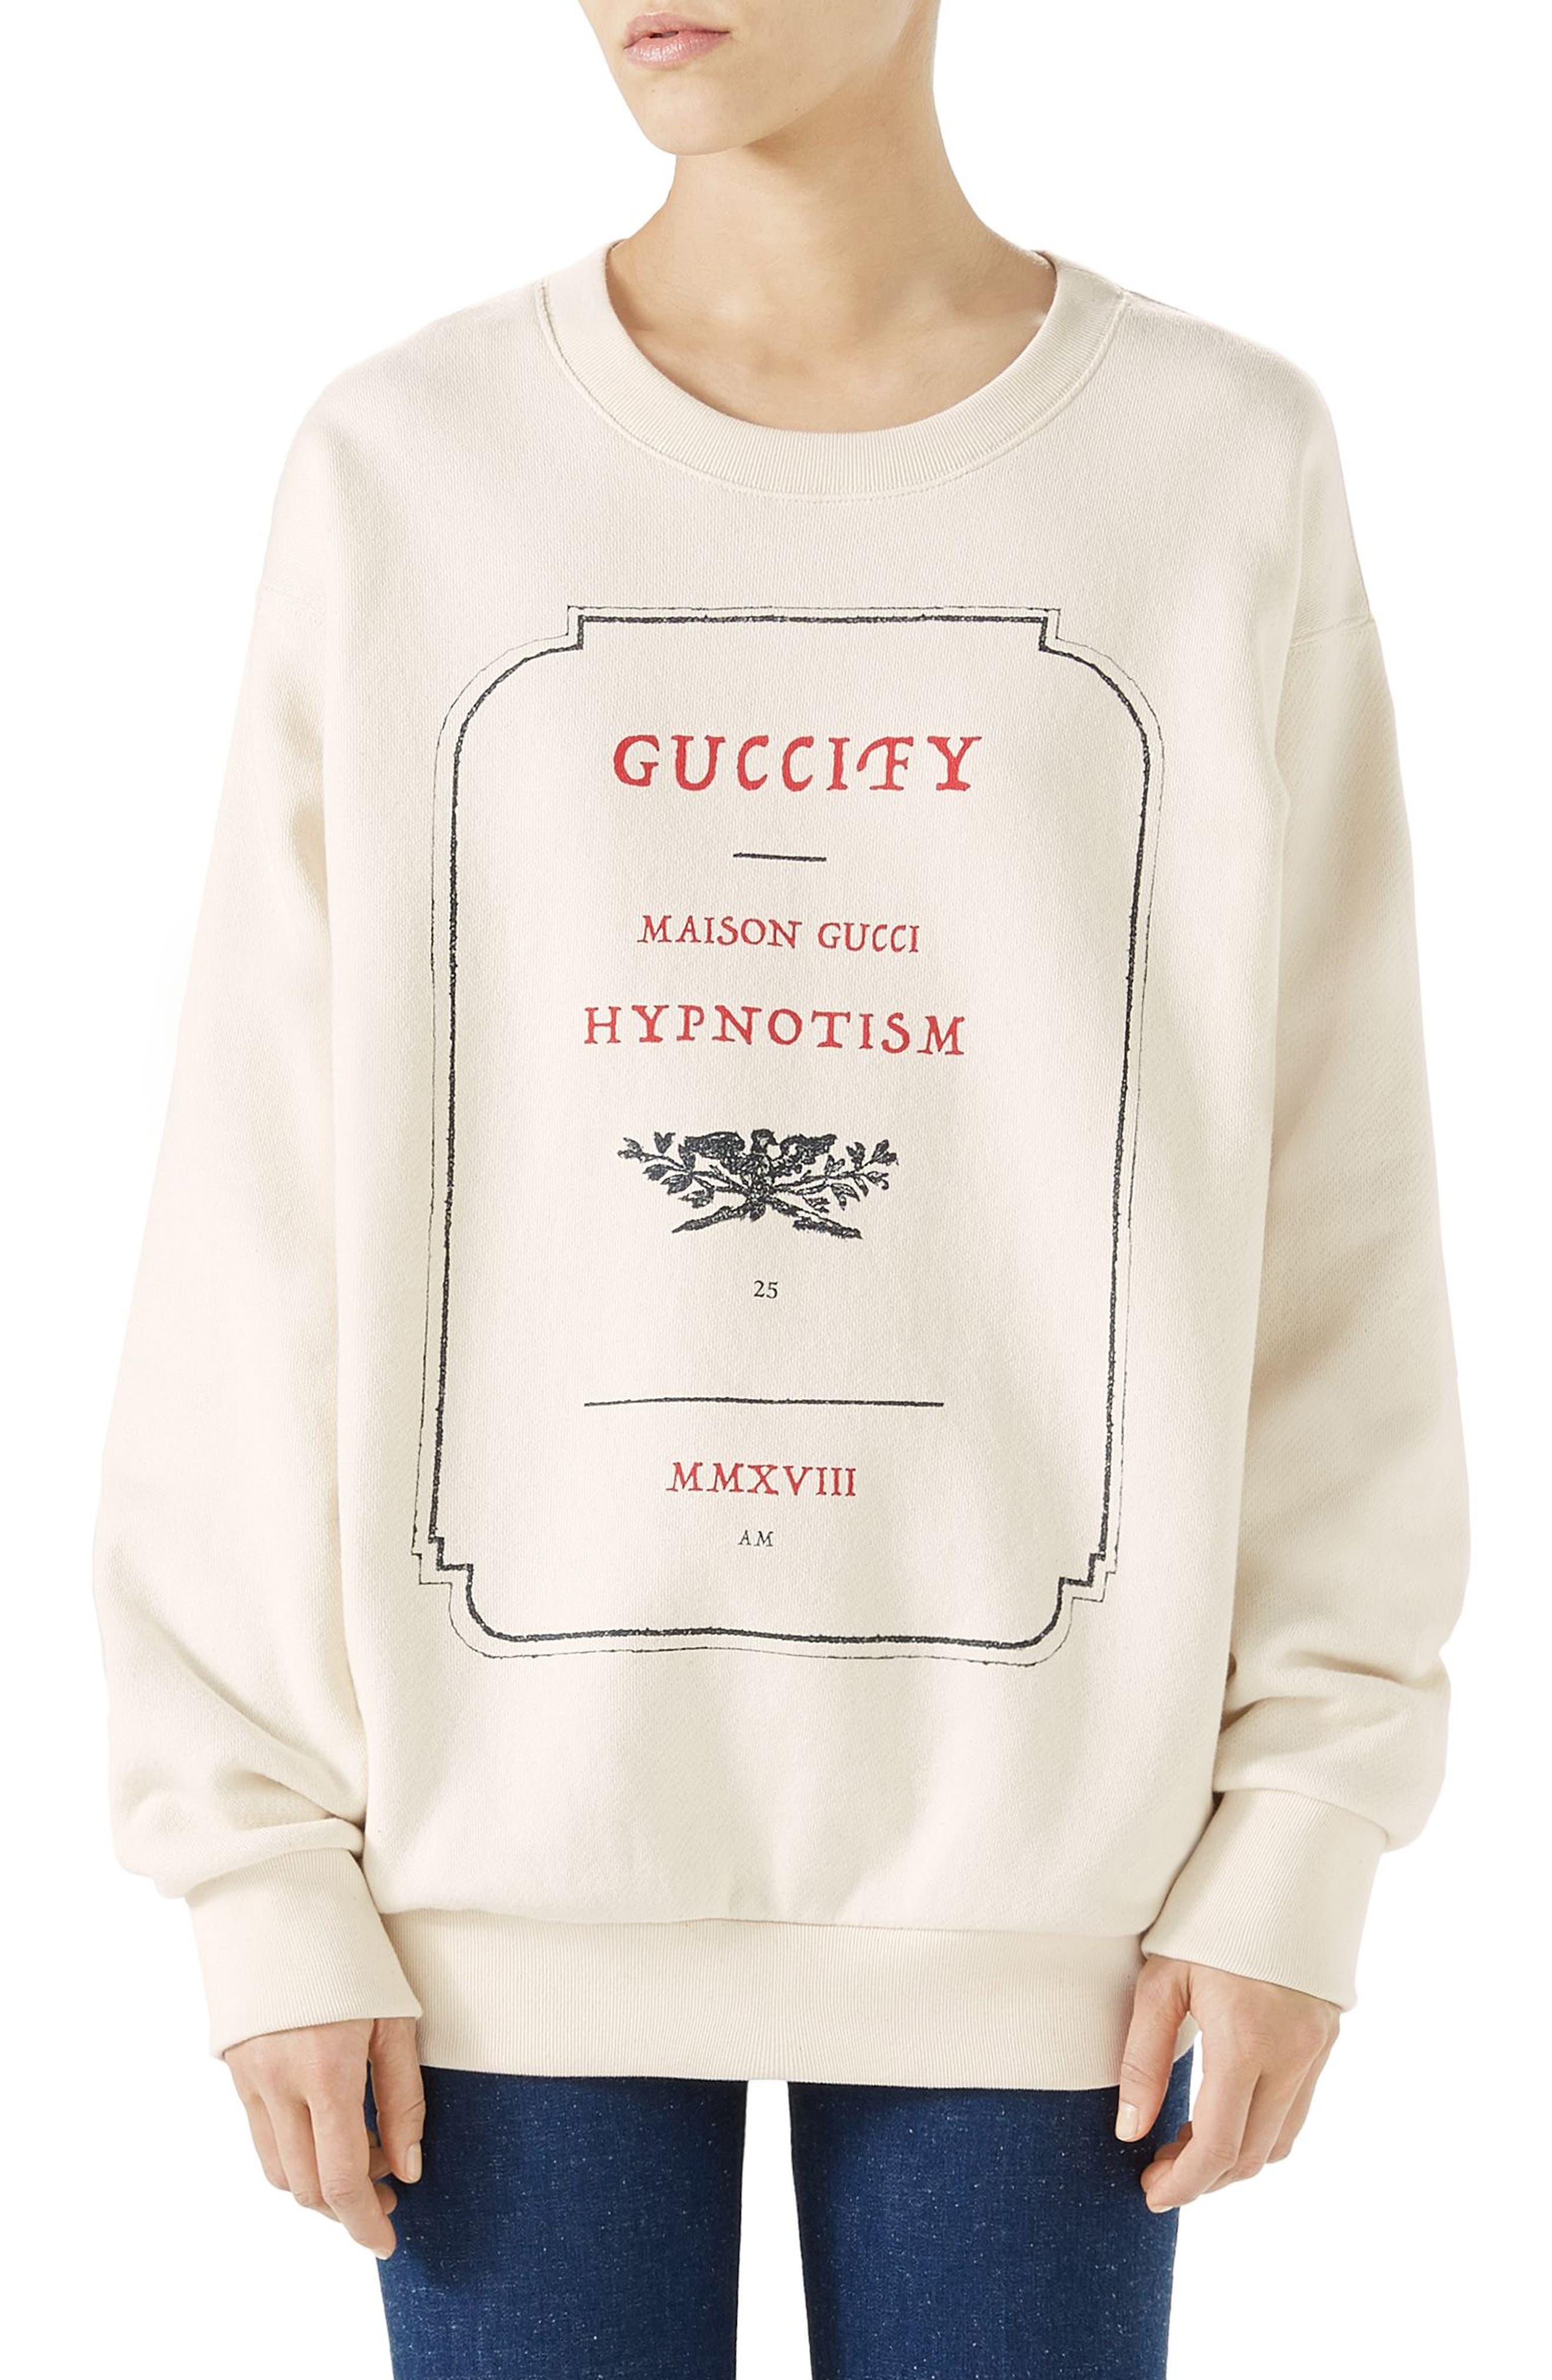 Hypnotism Graphic Sweatshirt,                             Main thumbnail 1, color,                             Natural White/ Multicolor